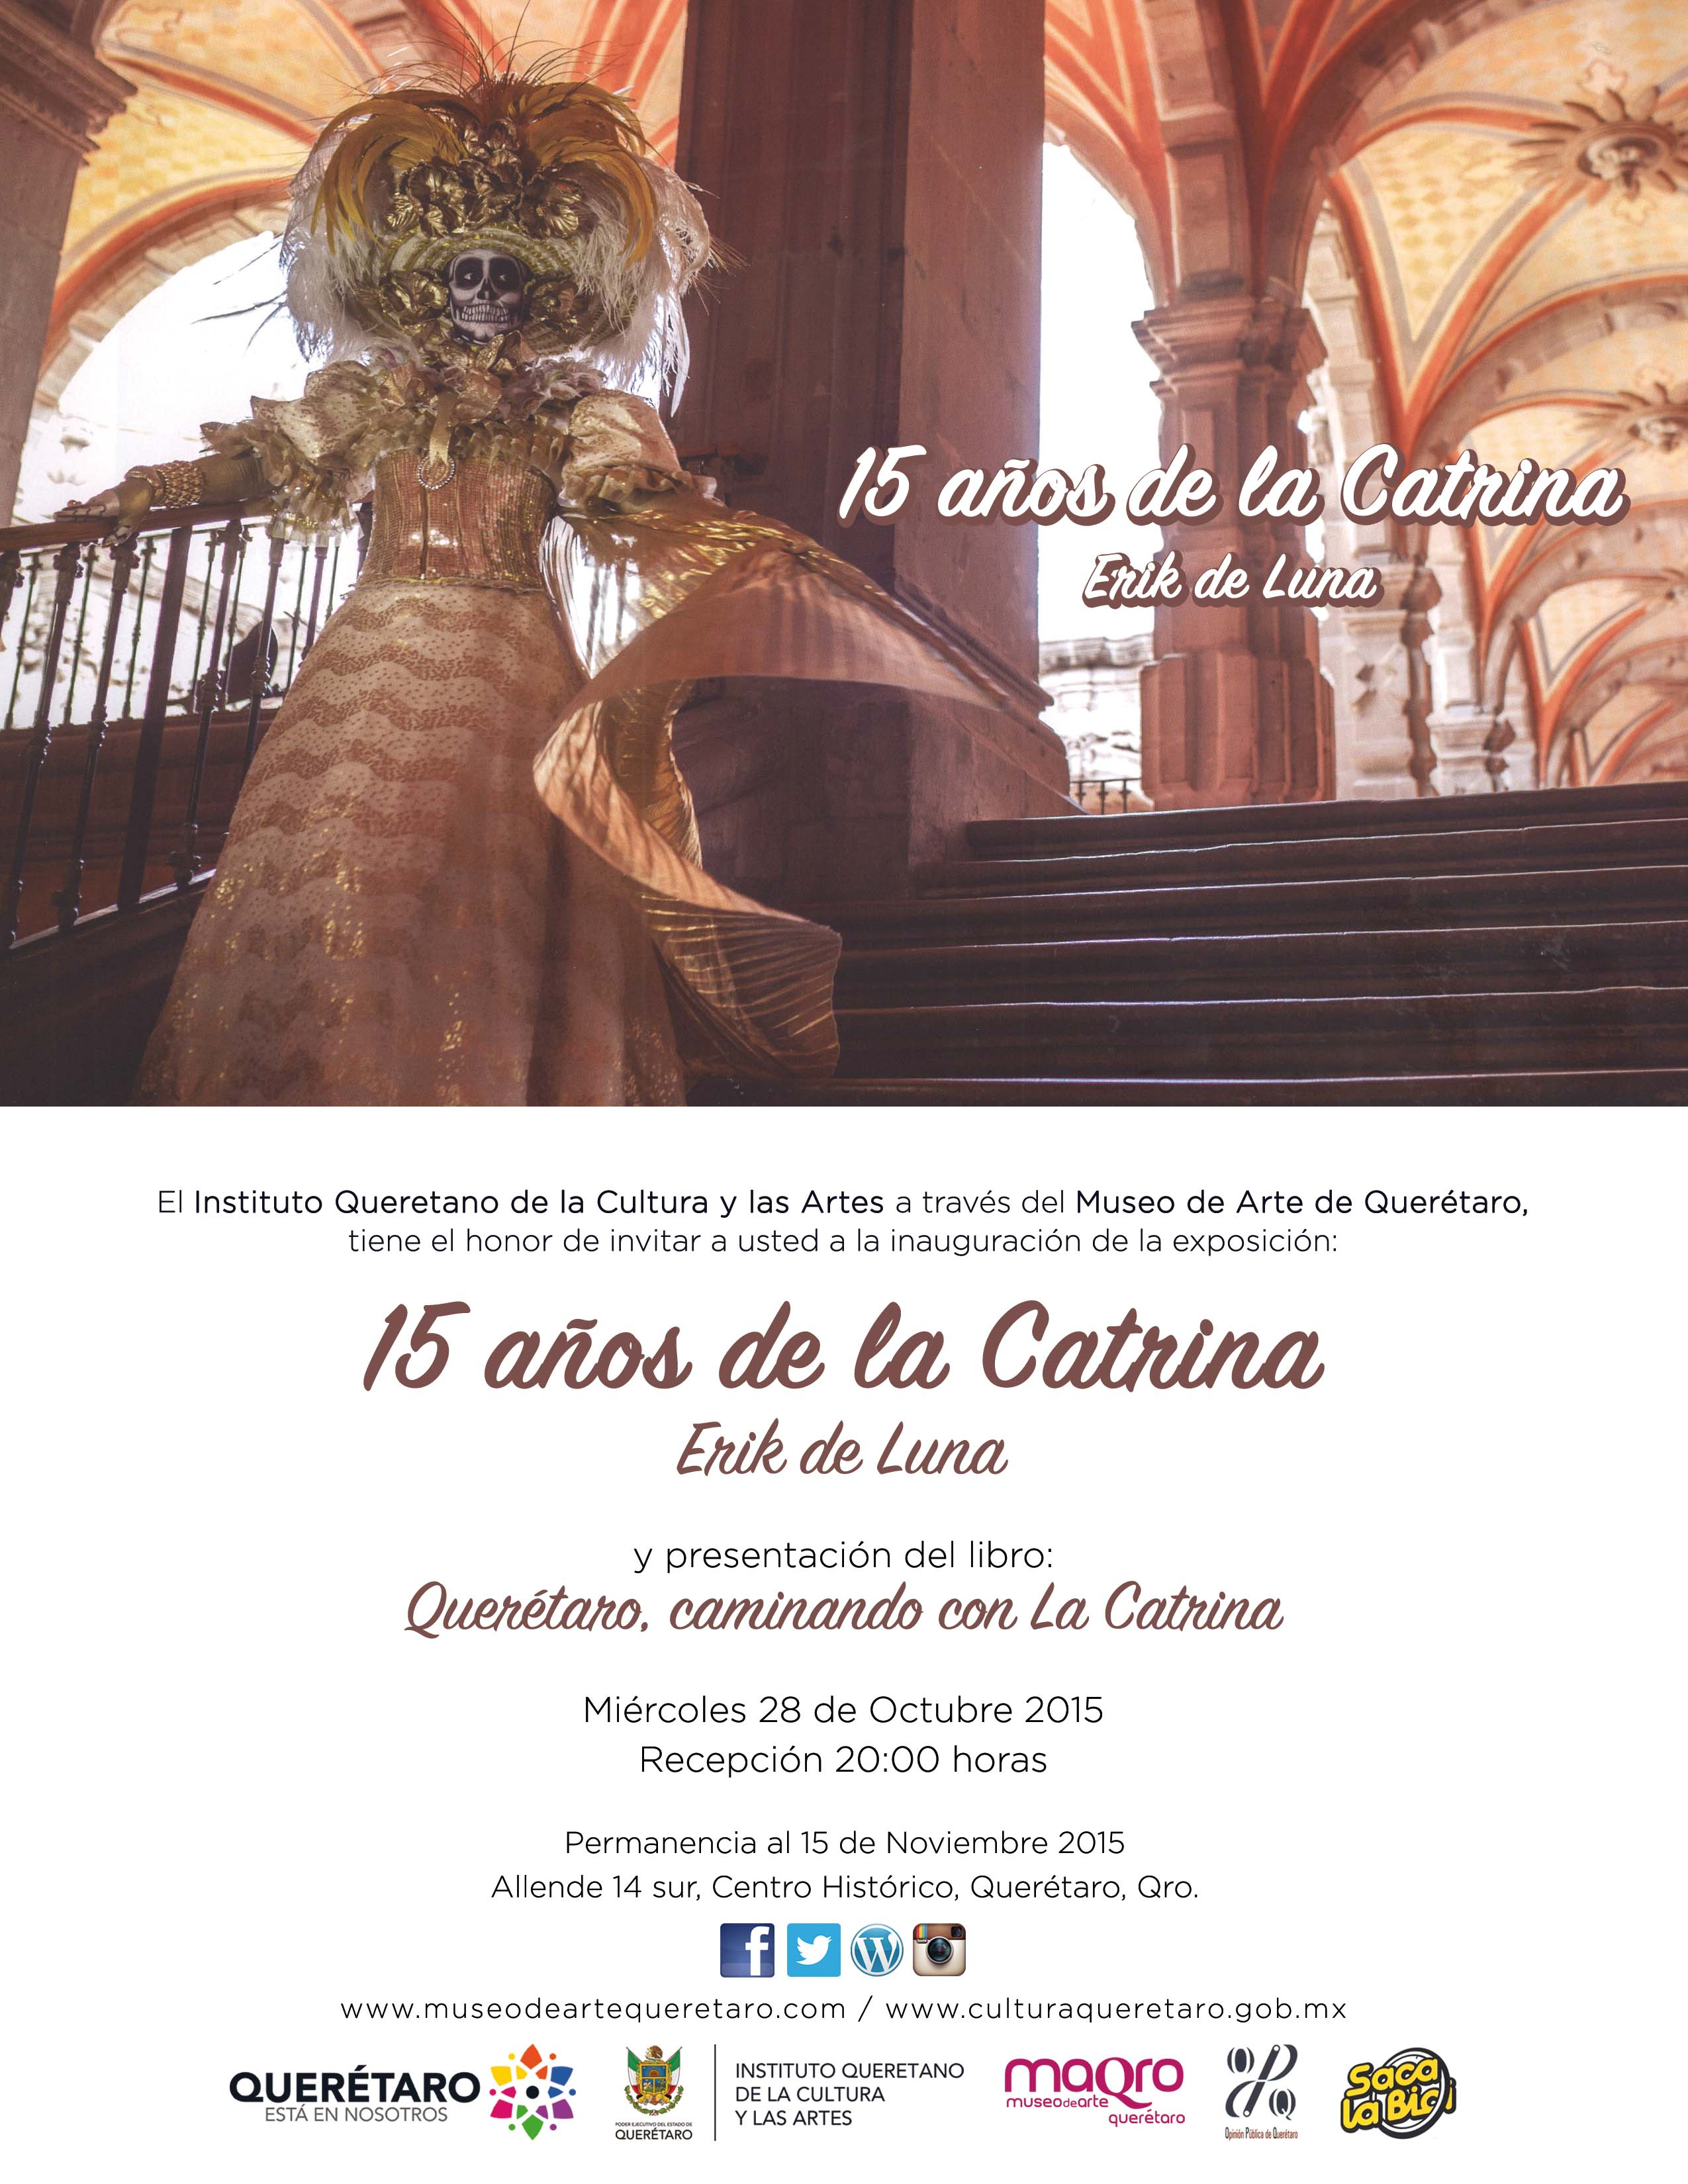 15 años de La Catrina – Erik de Luna – Miércoles 28 de Octubre